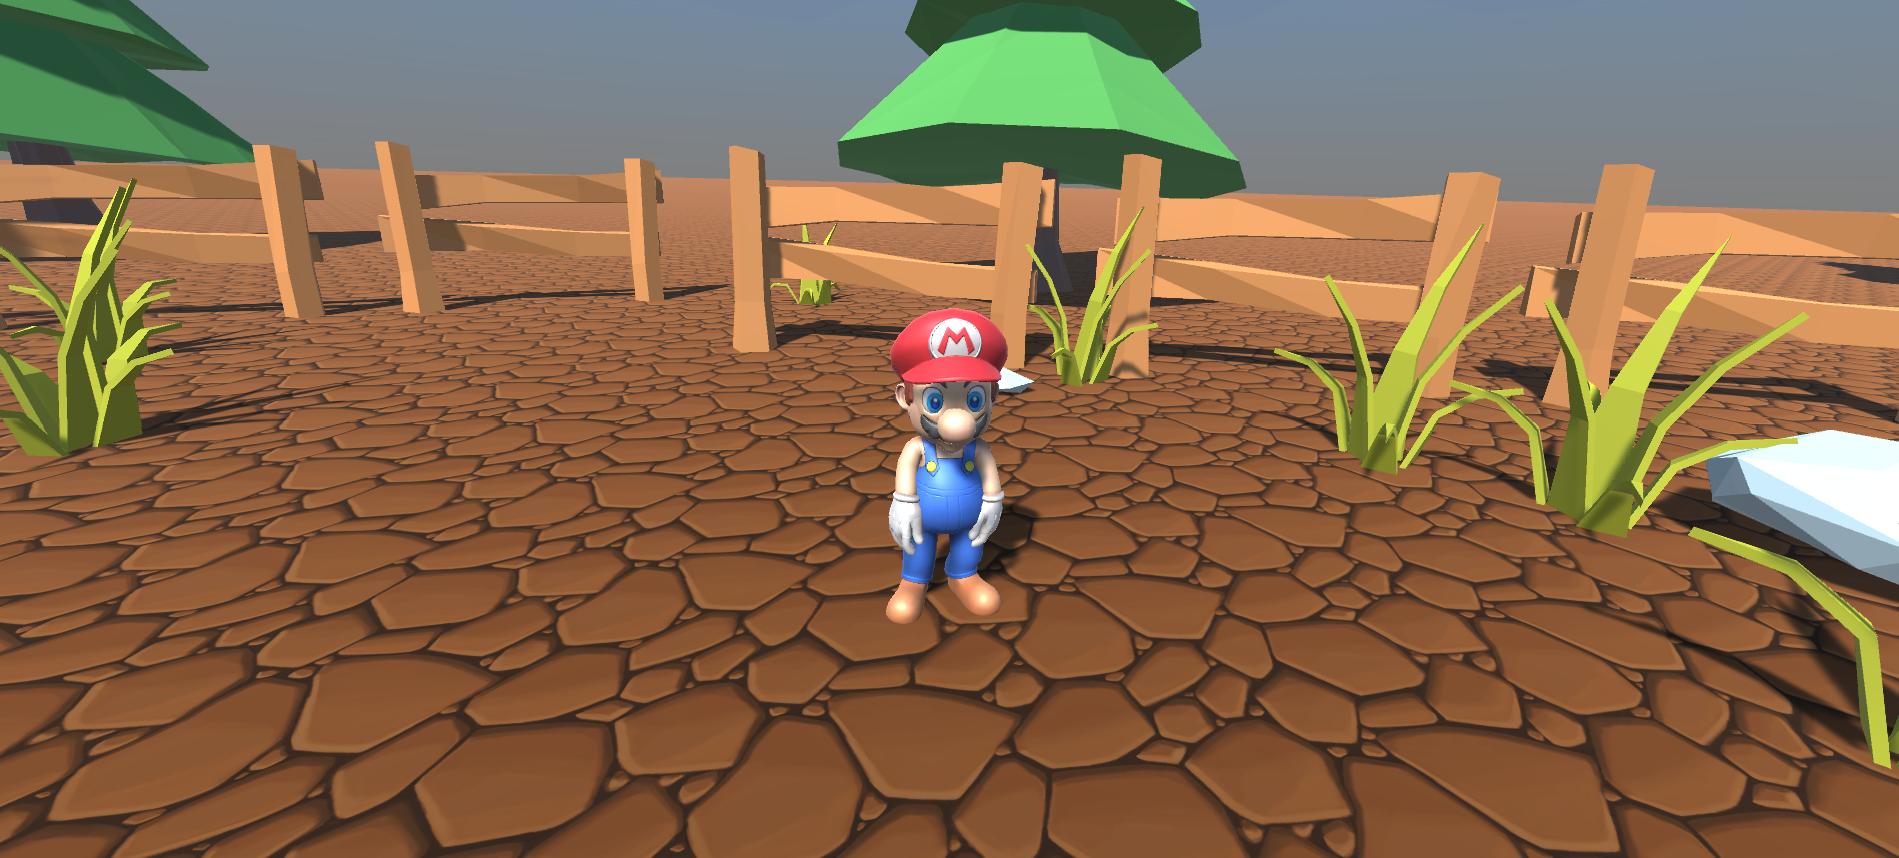 Mario Dancer